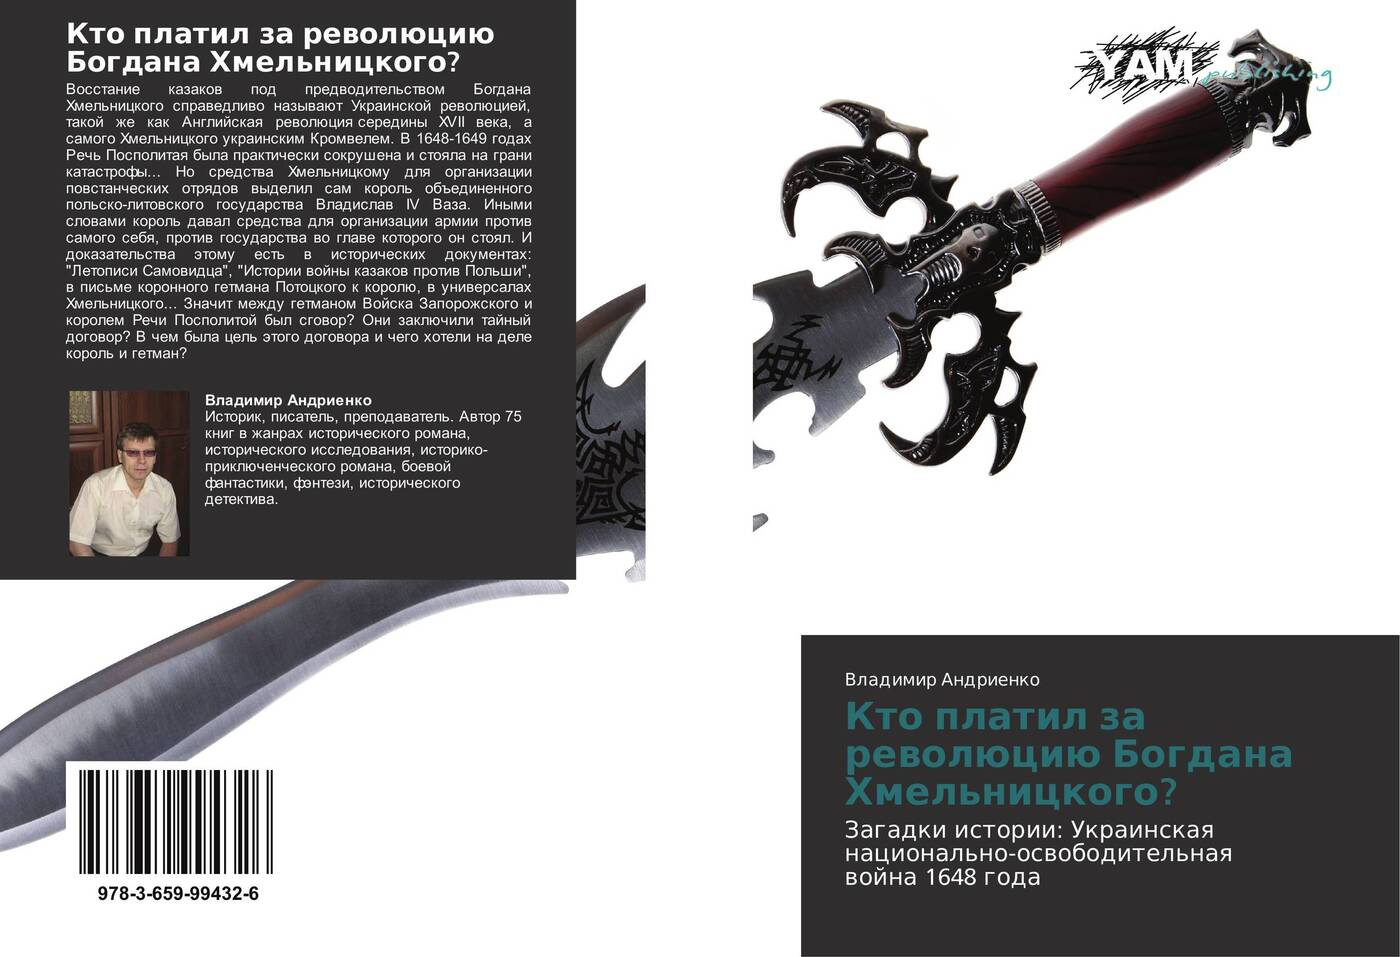 Владимир Андриенко Кто платил за революцию Богдана Хмельницкого? карандаш хмельницкого